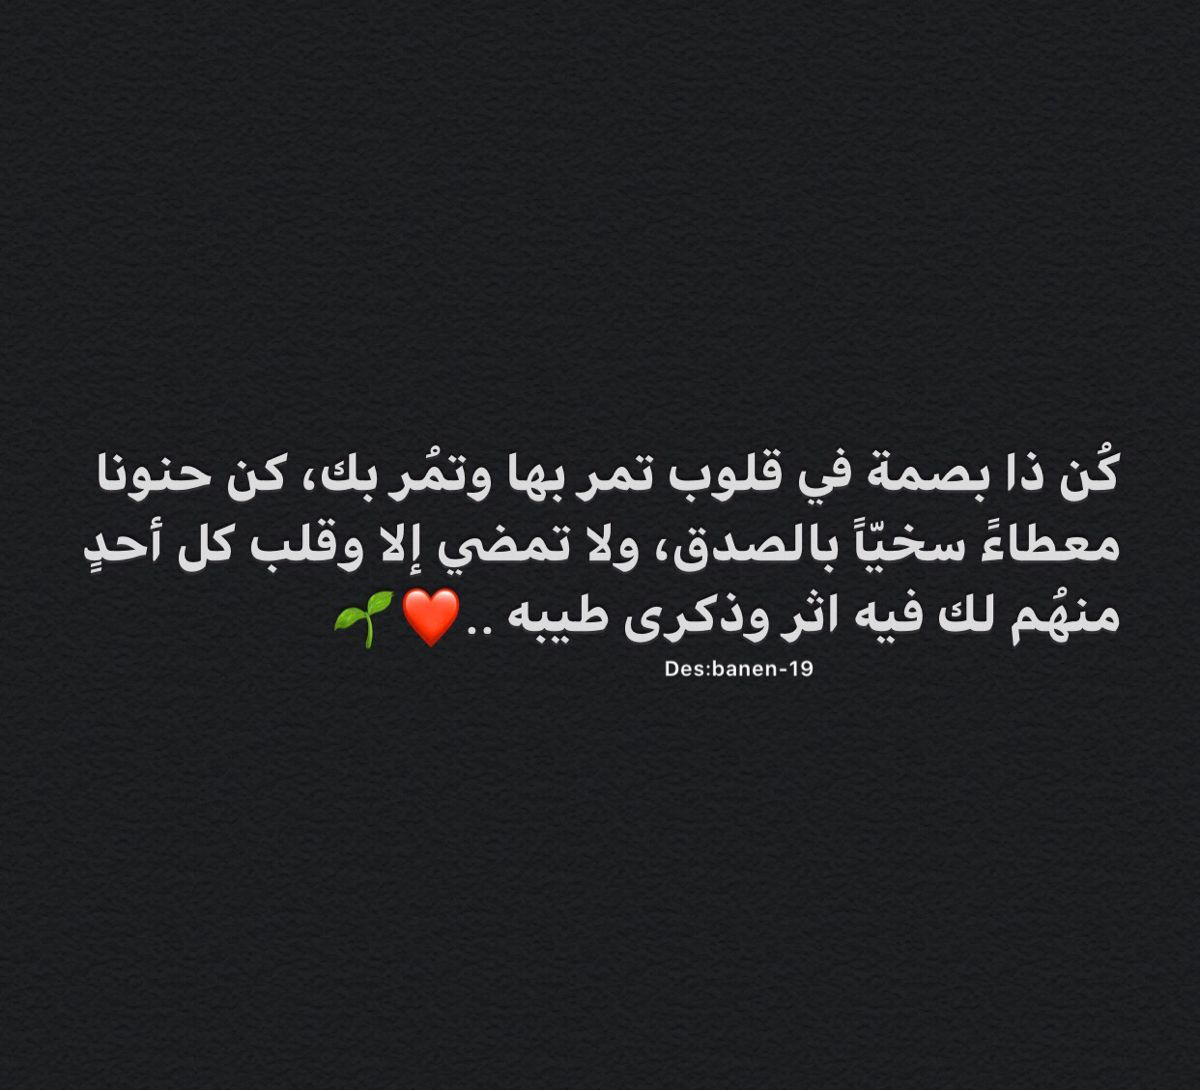 Pin By أ ي أ م أ ل س ـع أ د ه ـ On صور متنوعه Calligraphy Arabic Calligraphy